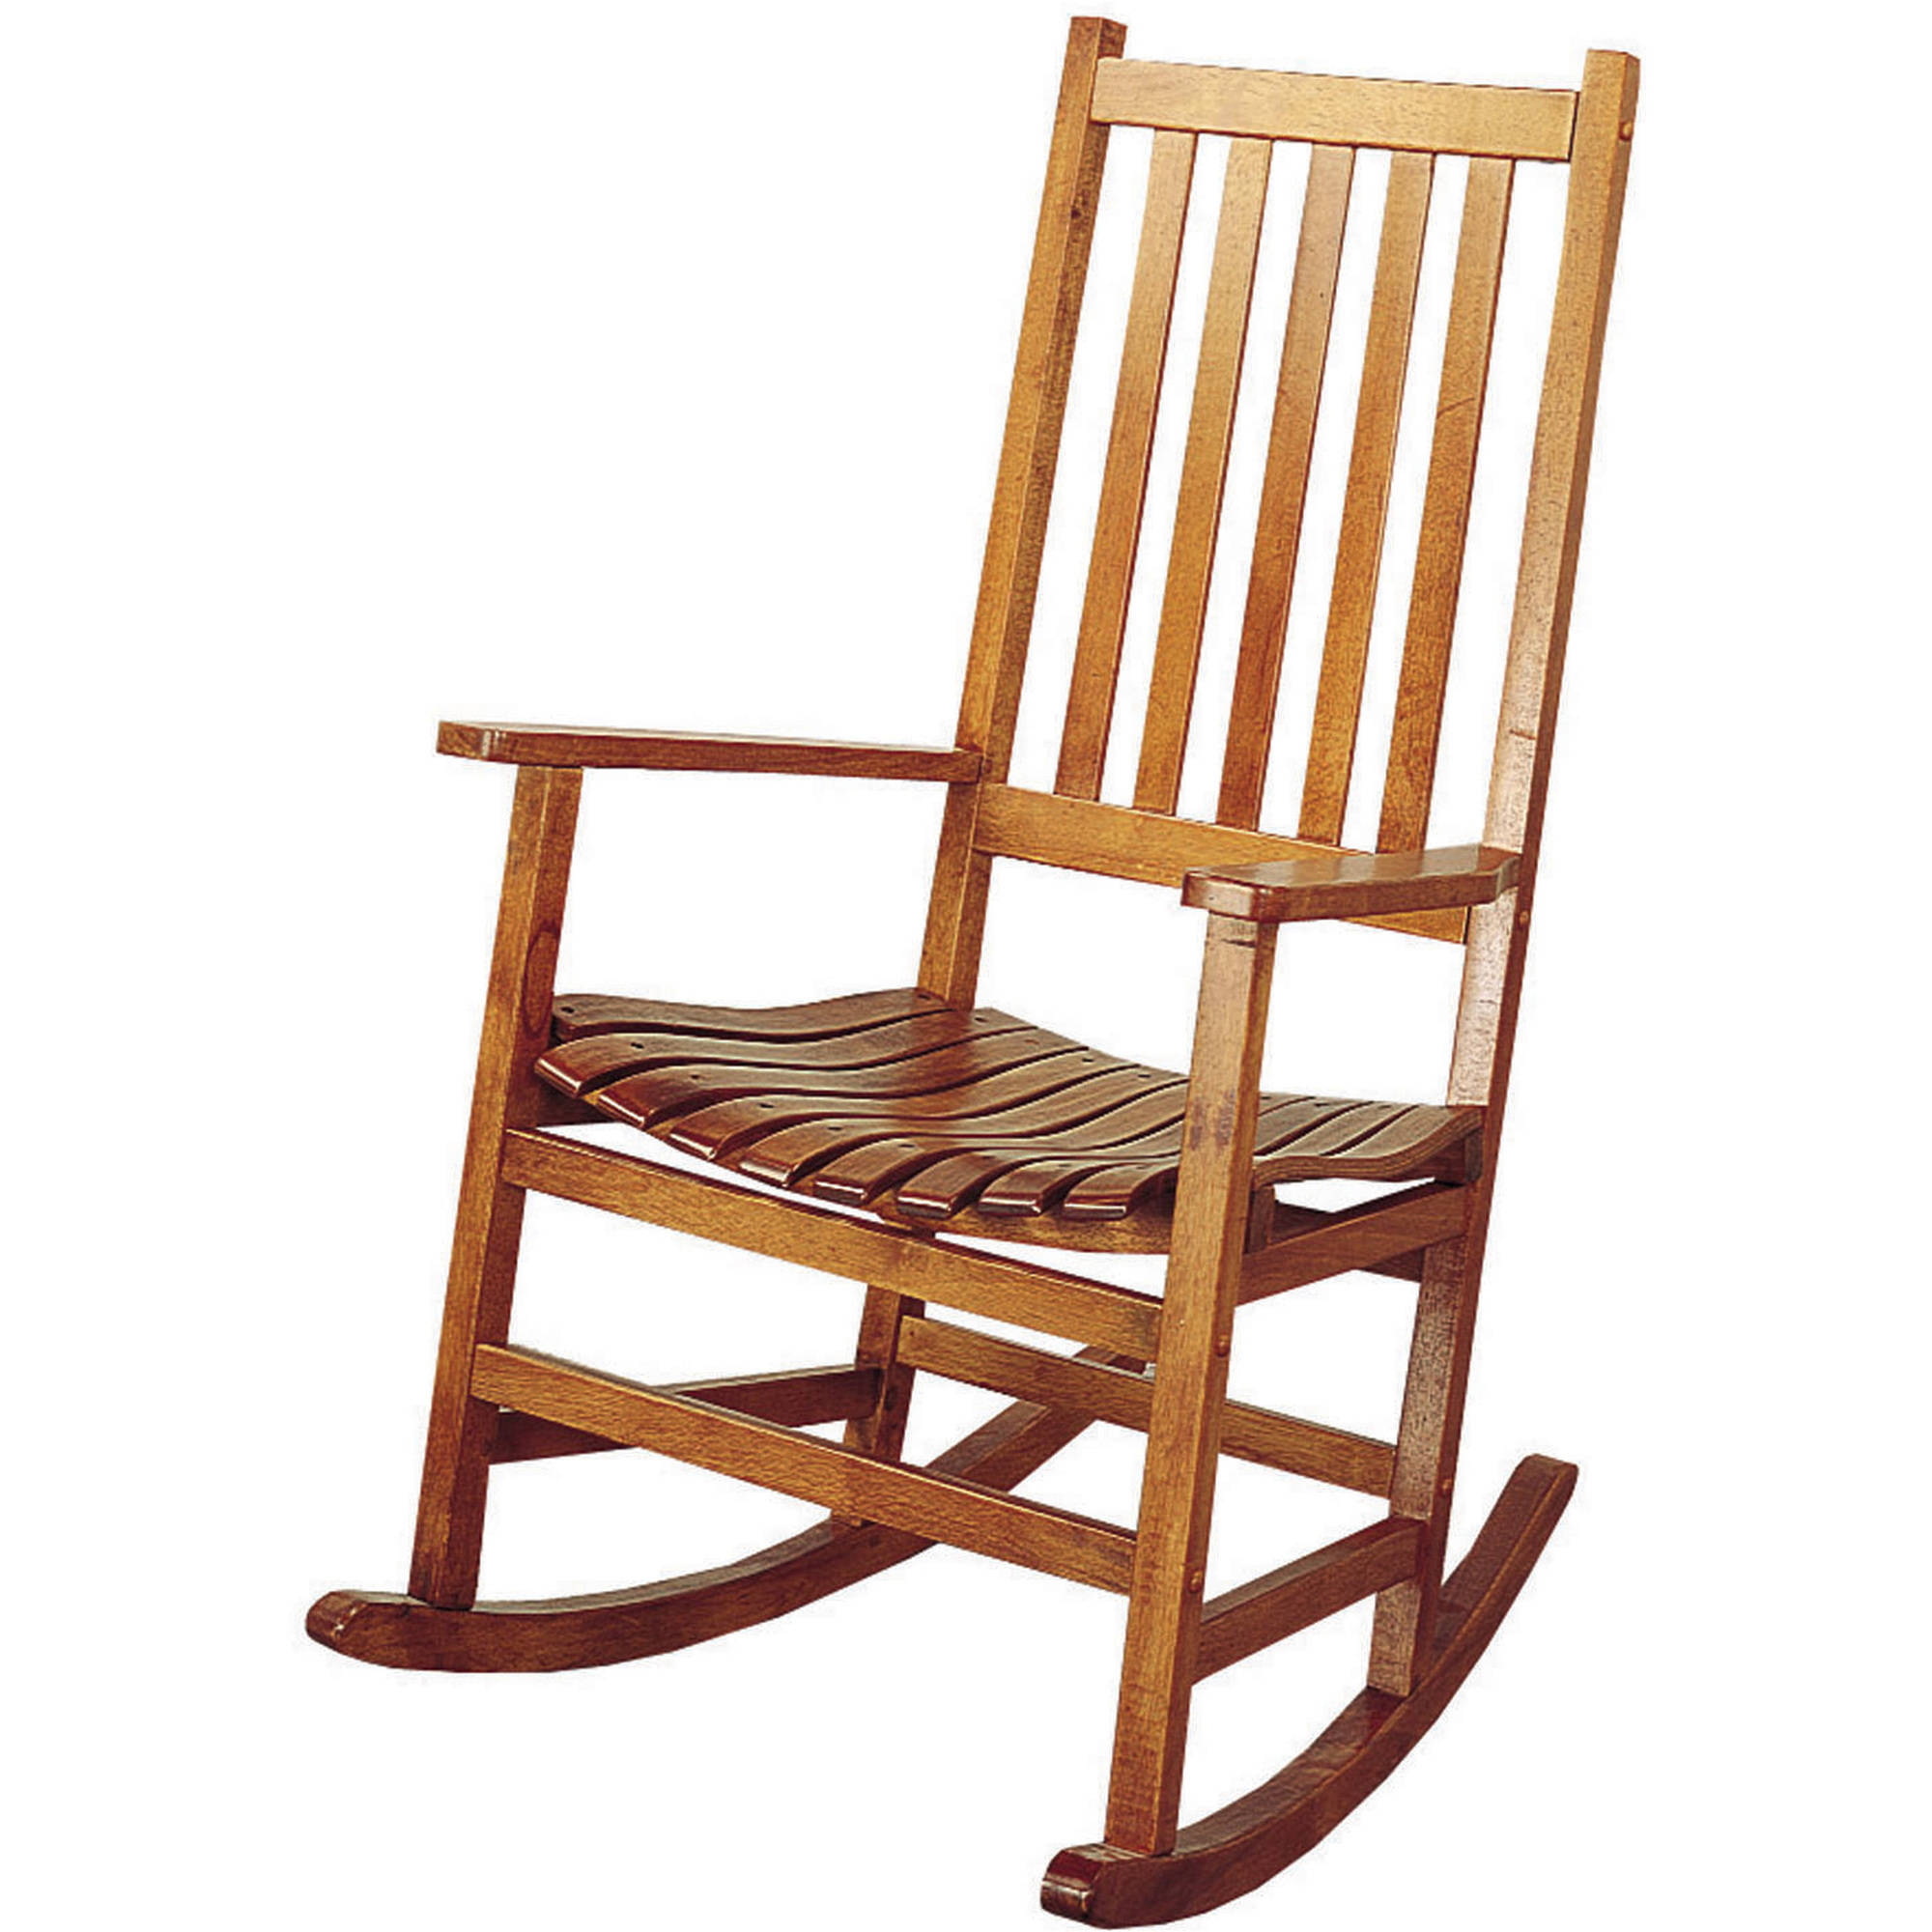 Wooden Rocking Chairs wooden rocking chairs - walmart